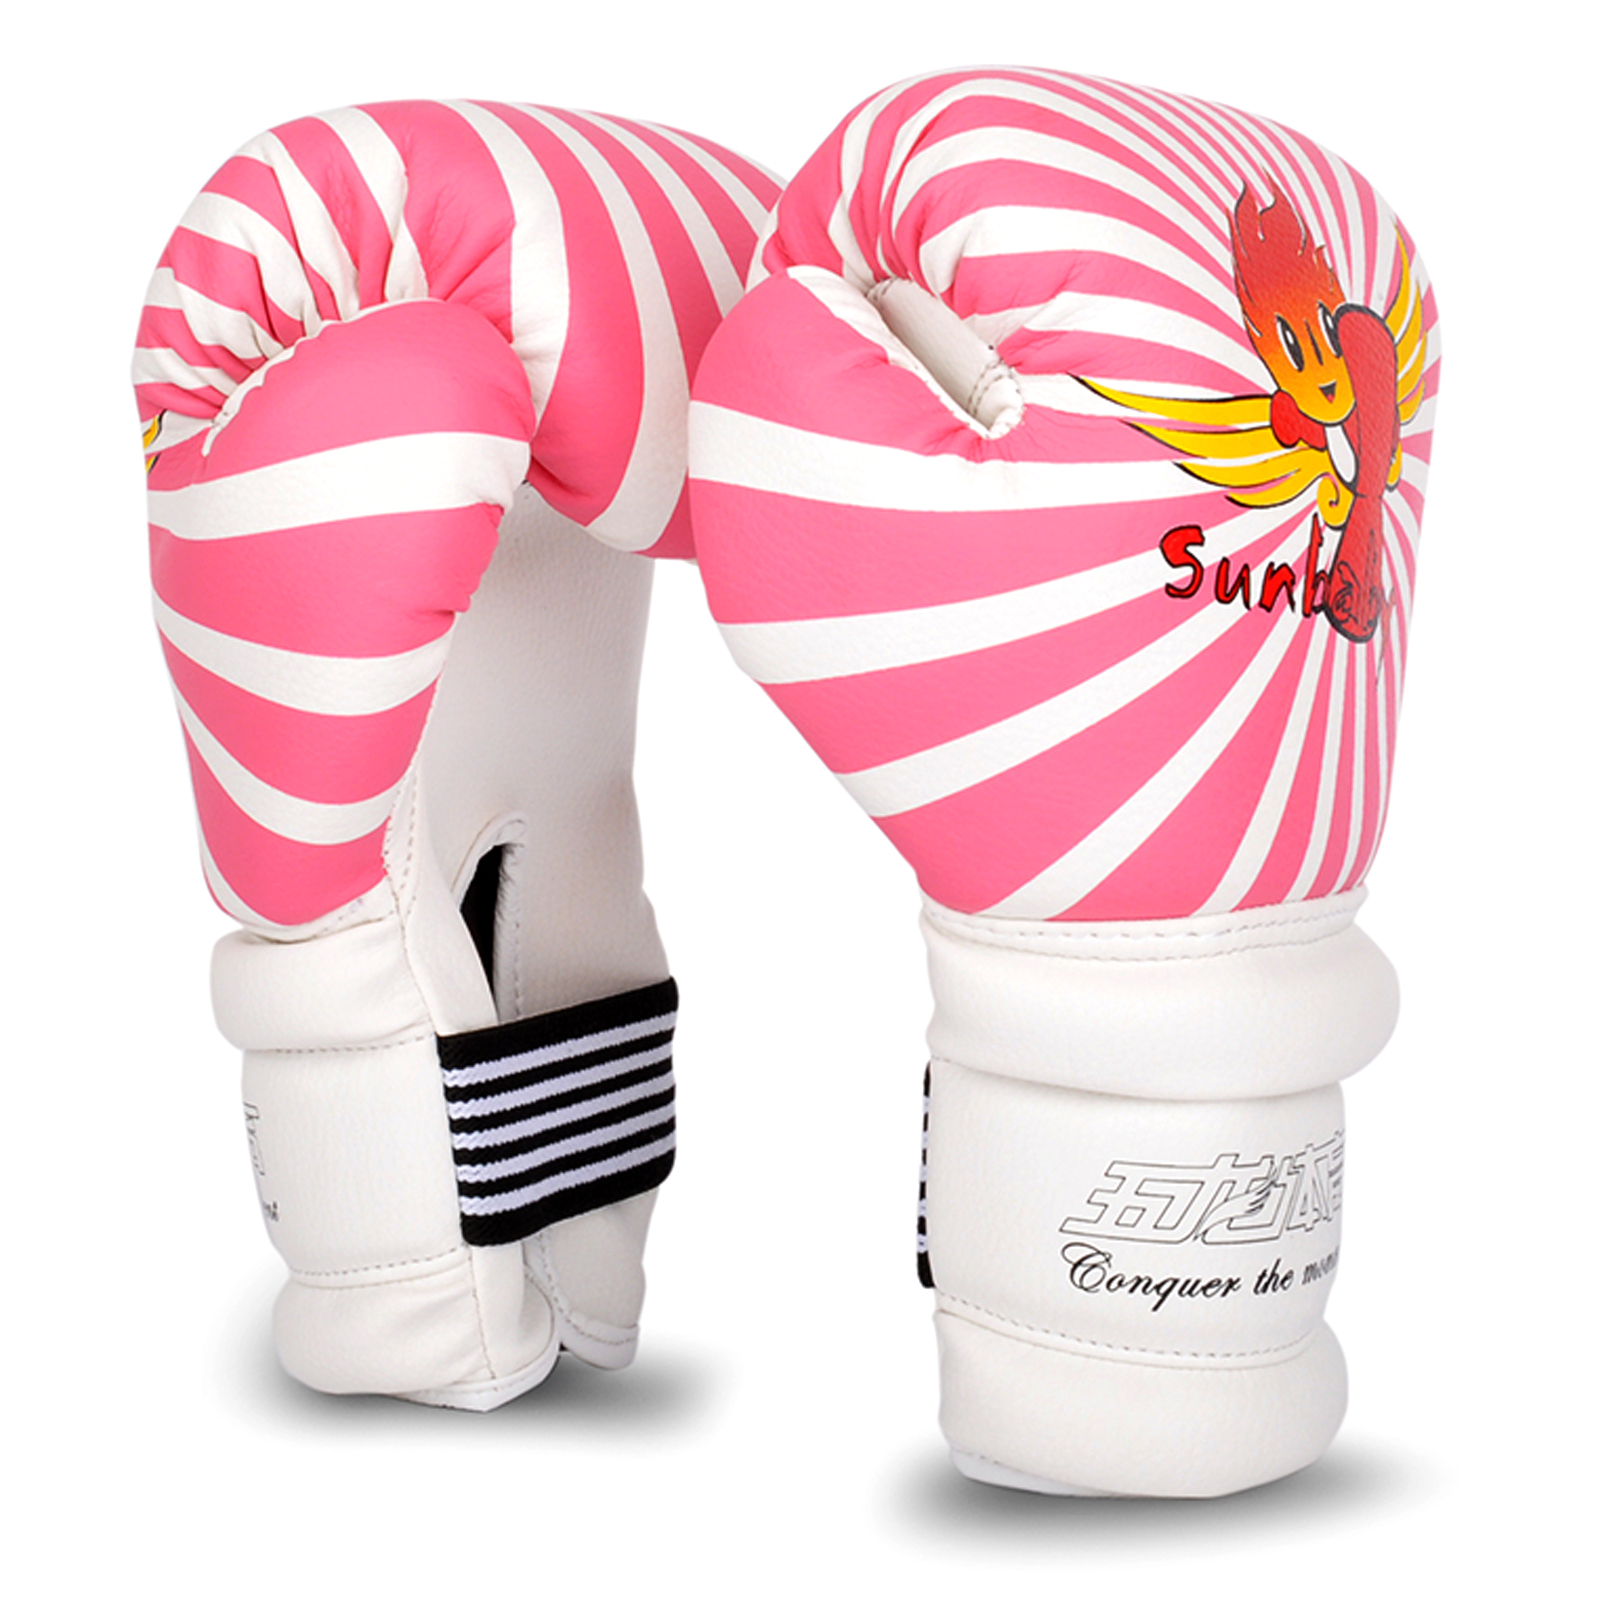 6oz Junior Punchbag Sparring MMW Training Kick Boxing Gloves Kids Boxing Gloves